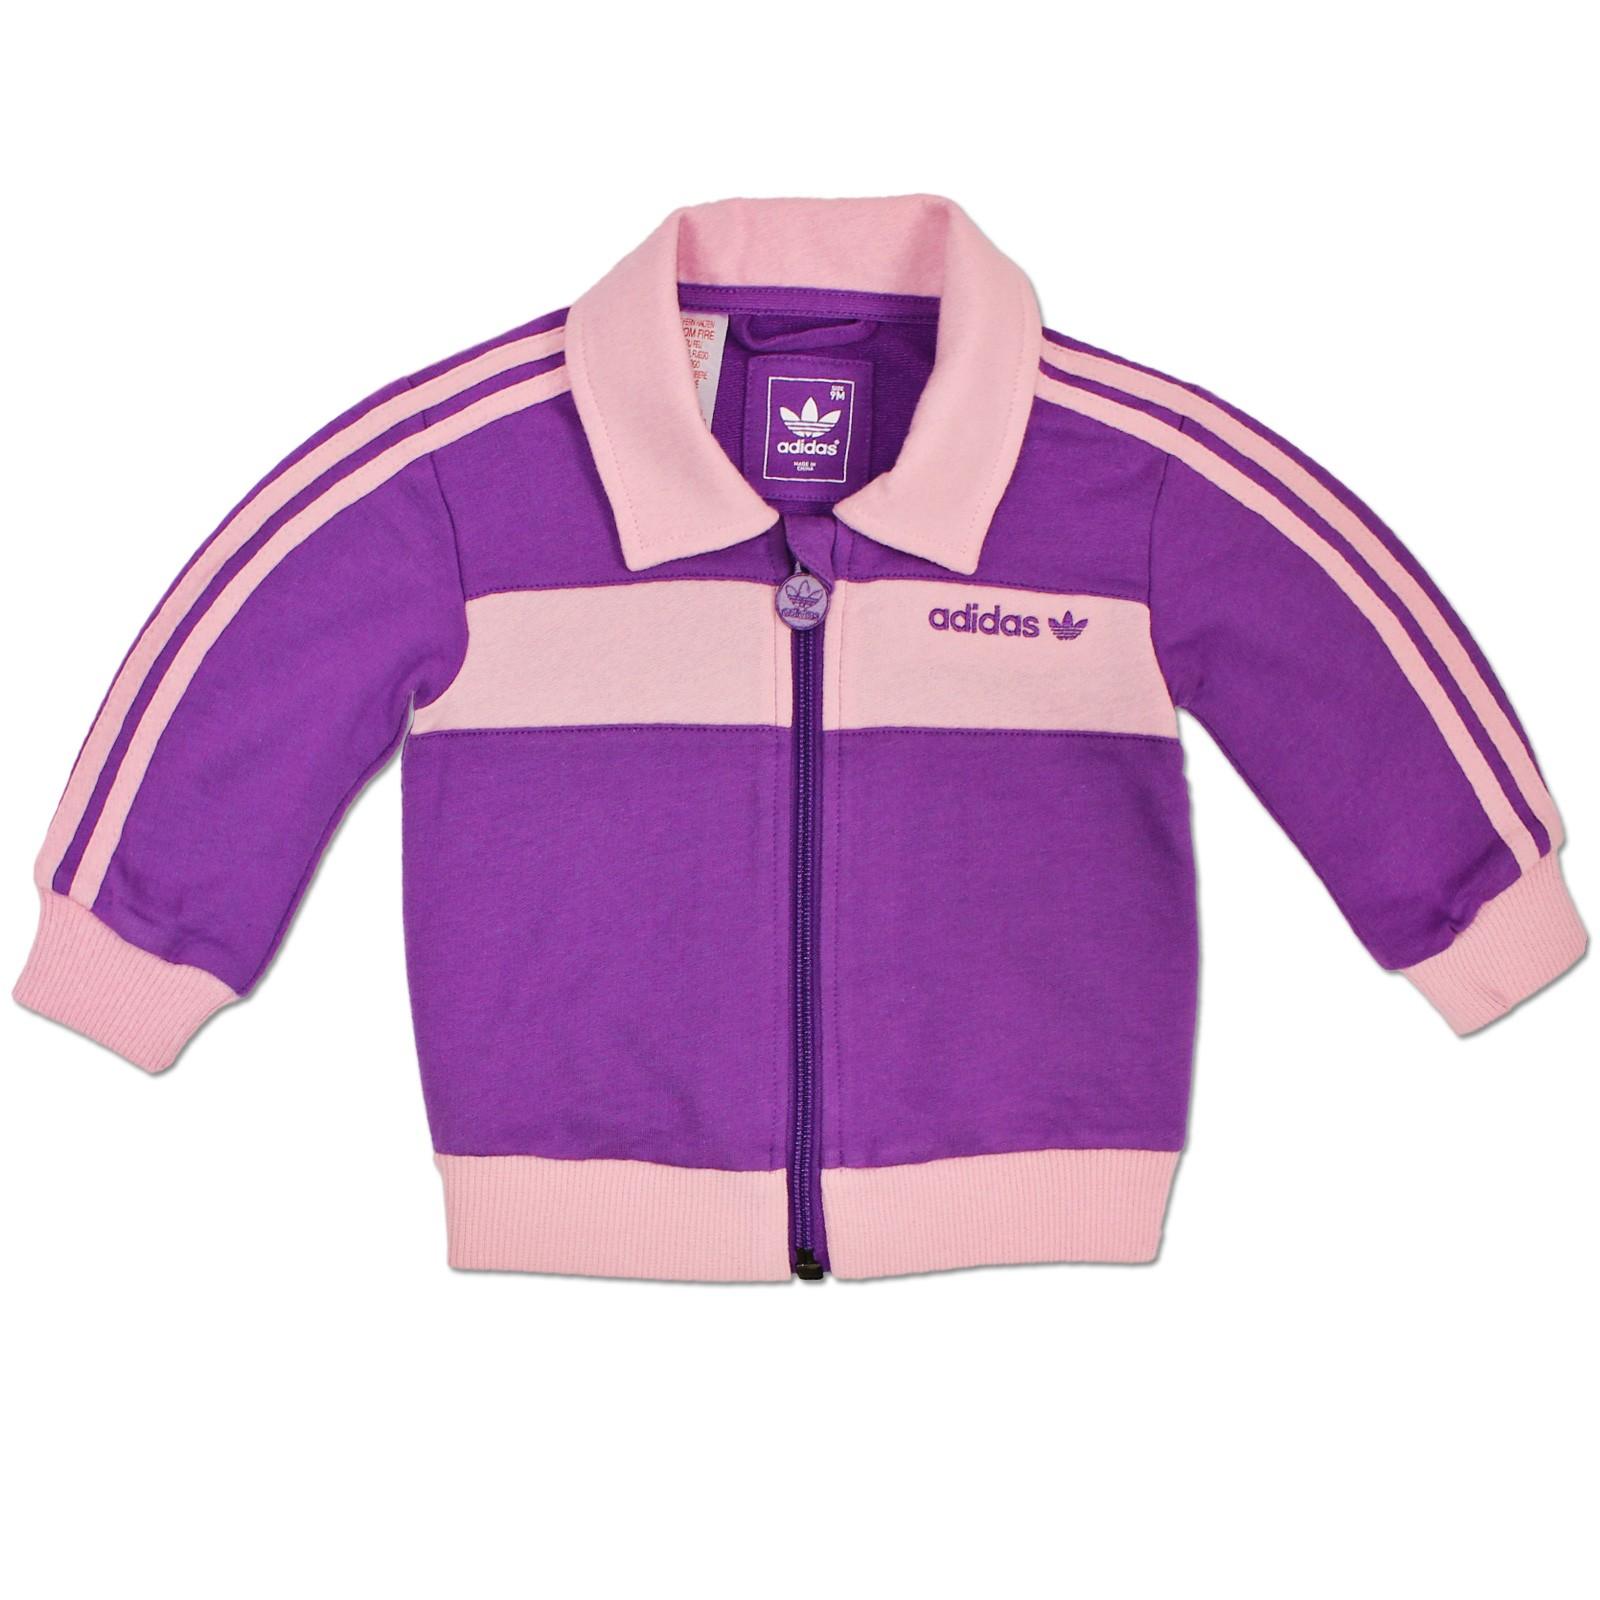 adidas originals beckenbauer kinder trainingsanzug set baby sport anzug lila kinder jogger. Black Bedroom Furniture Sets. Home Design Ideas